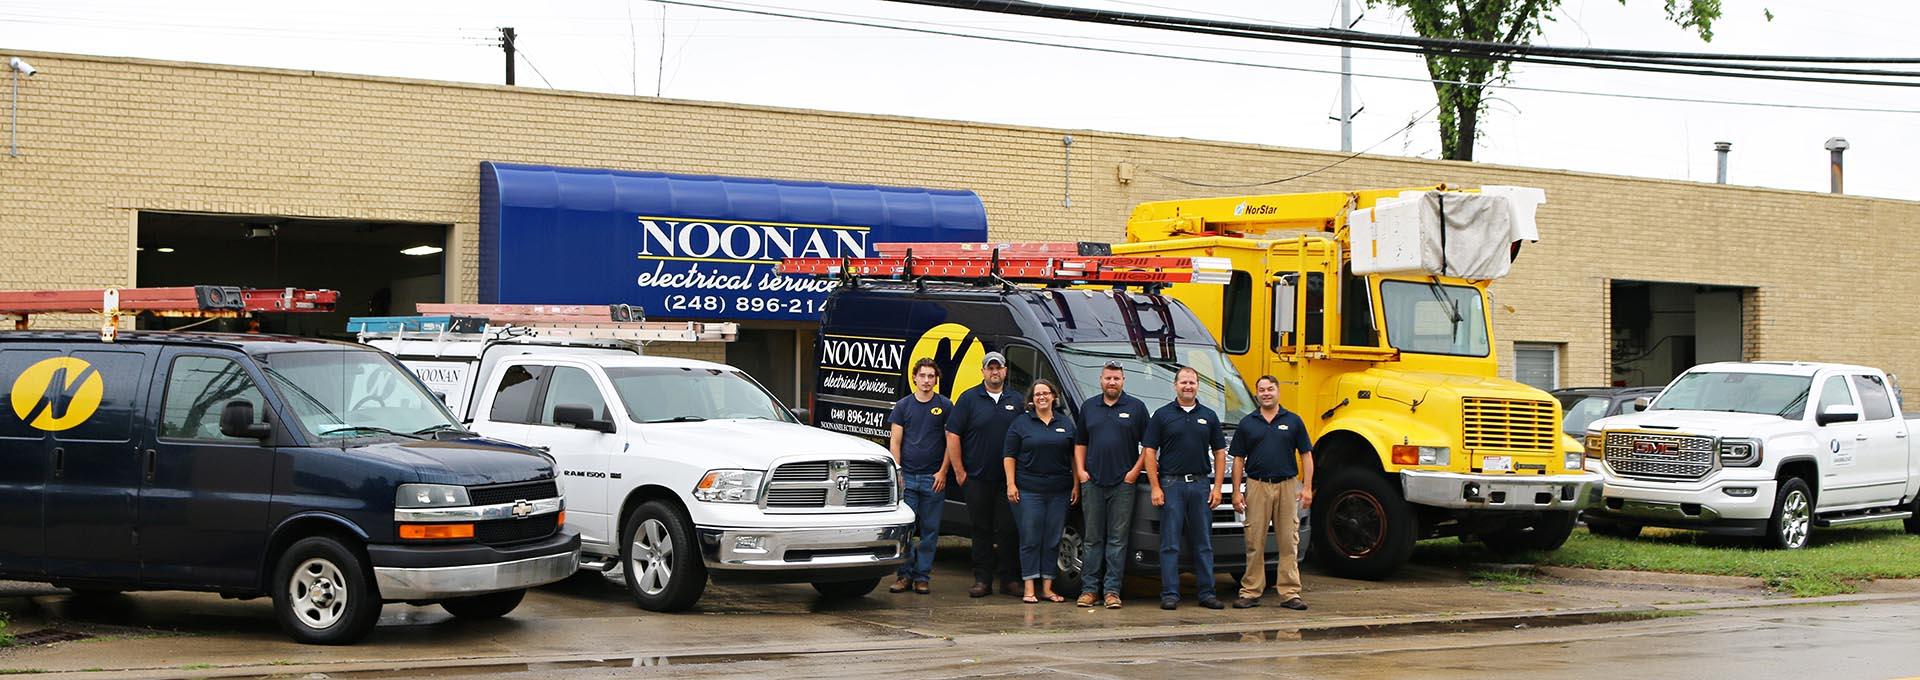 Noonan Electrical